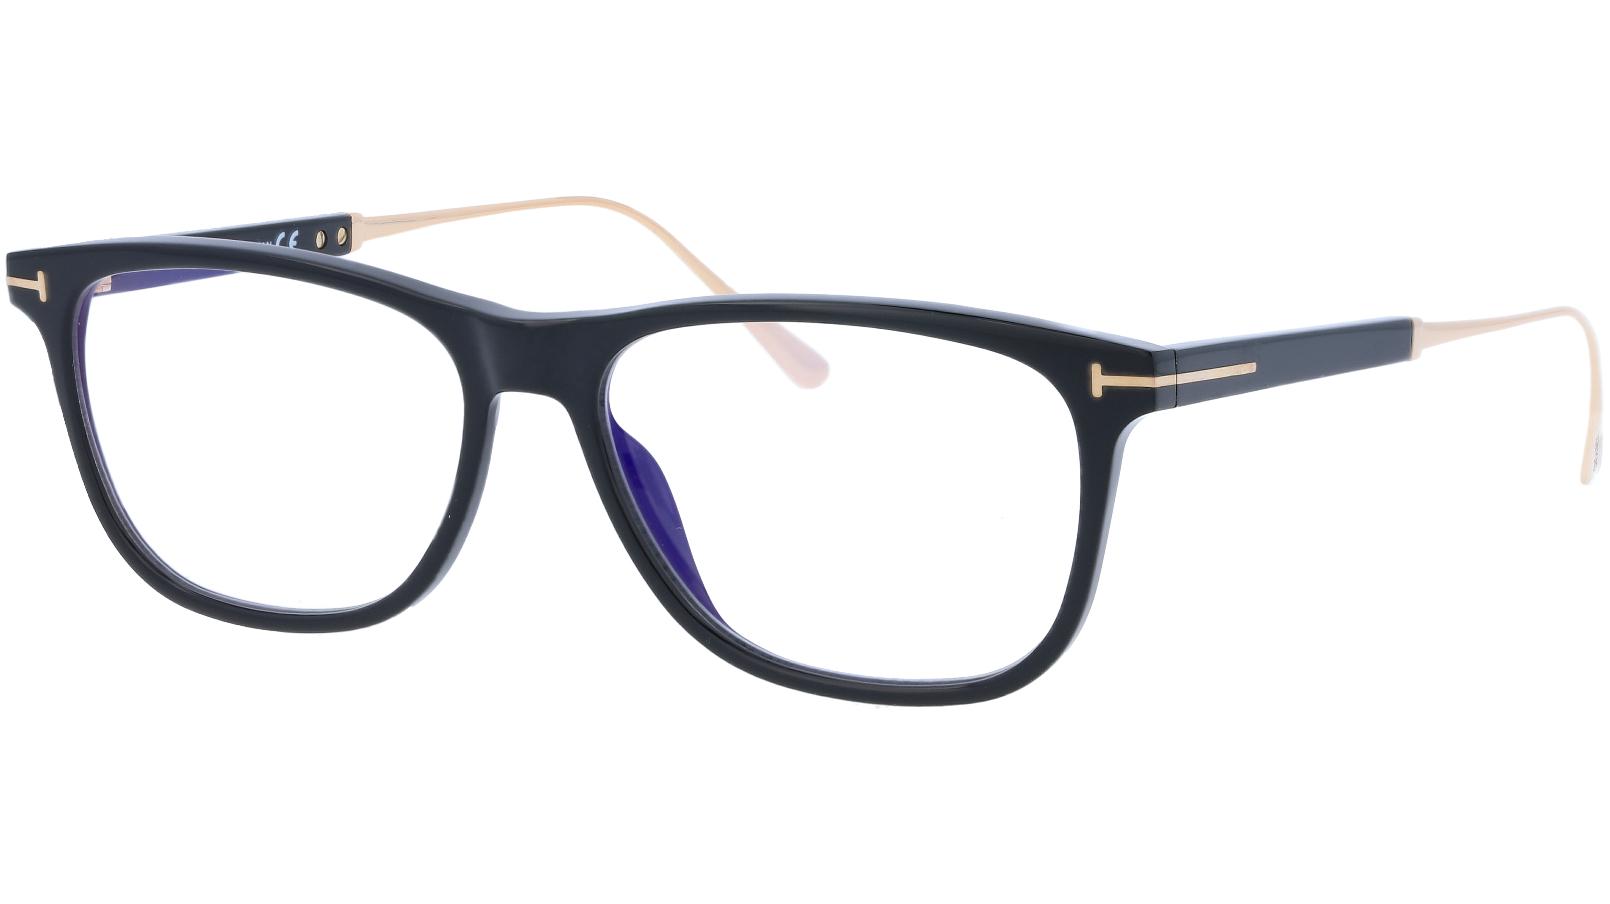 Tom Ford TF5589-B 001 55 Black Titanium Glasses